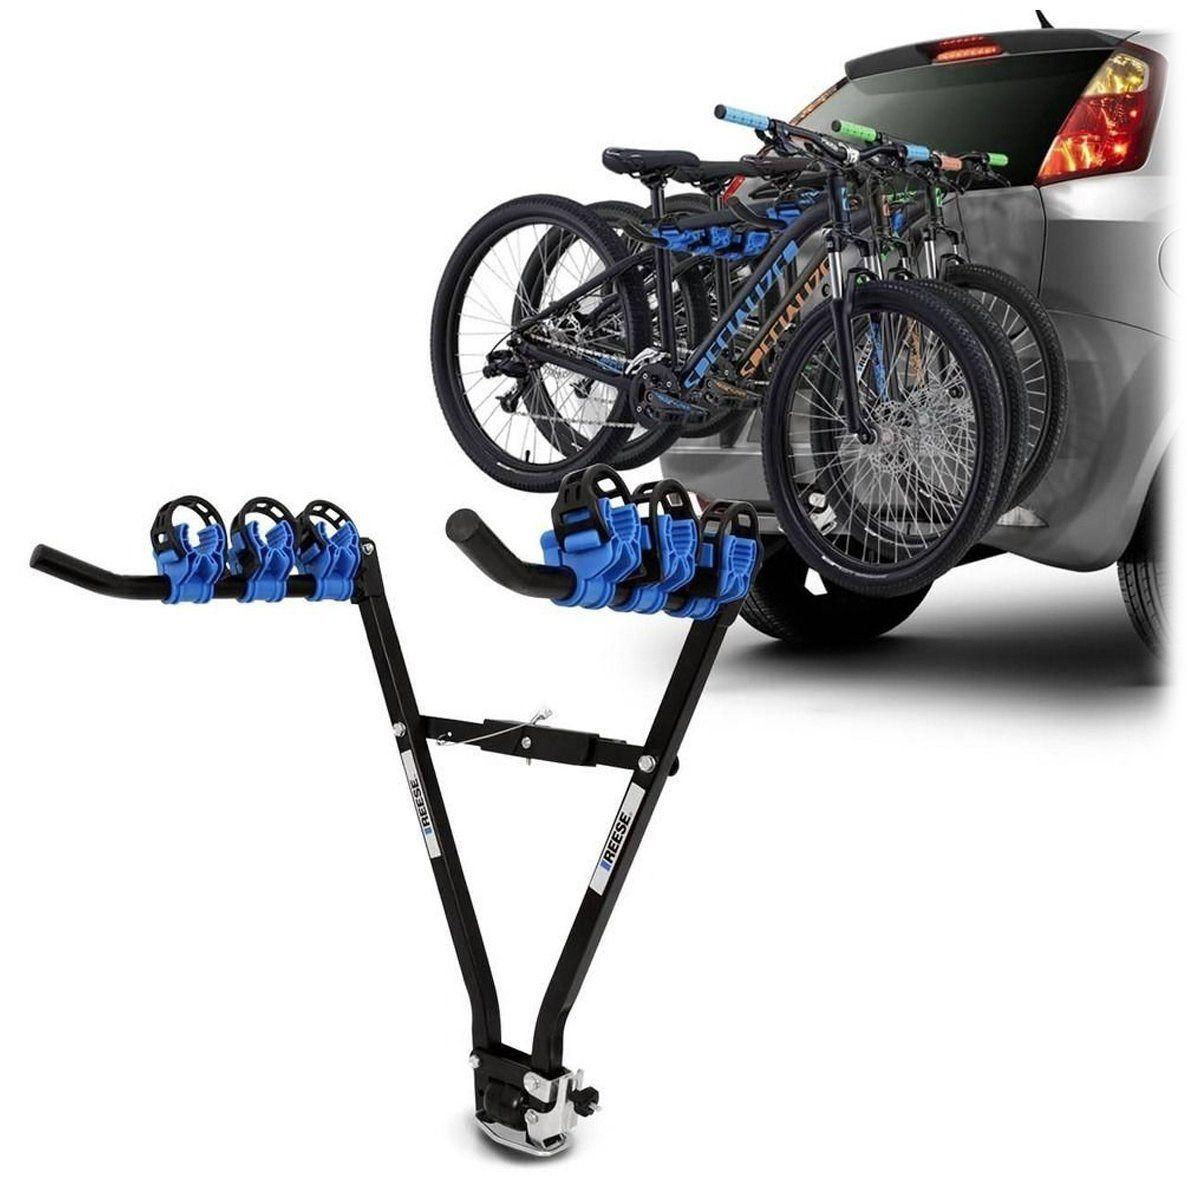 Suporte de Bicicletas Transbike De Engate Para 3 Bikes Reese